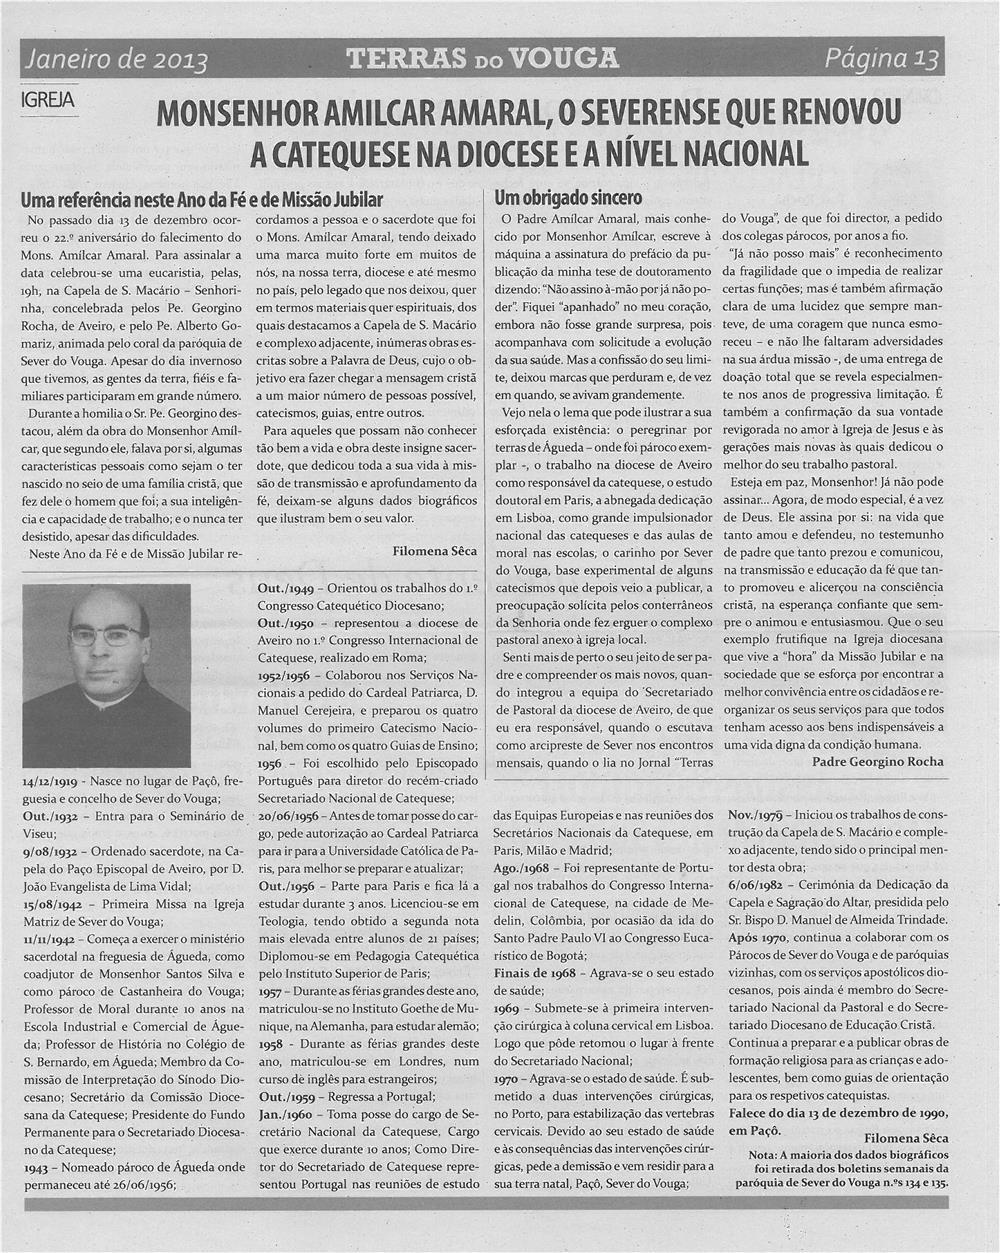 TV-jan13-p13-Monsenhor Amilcar Amaral, o severense que renovou a catequese na diocese e a nível nacional